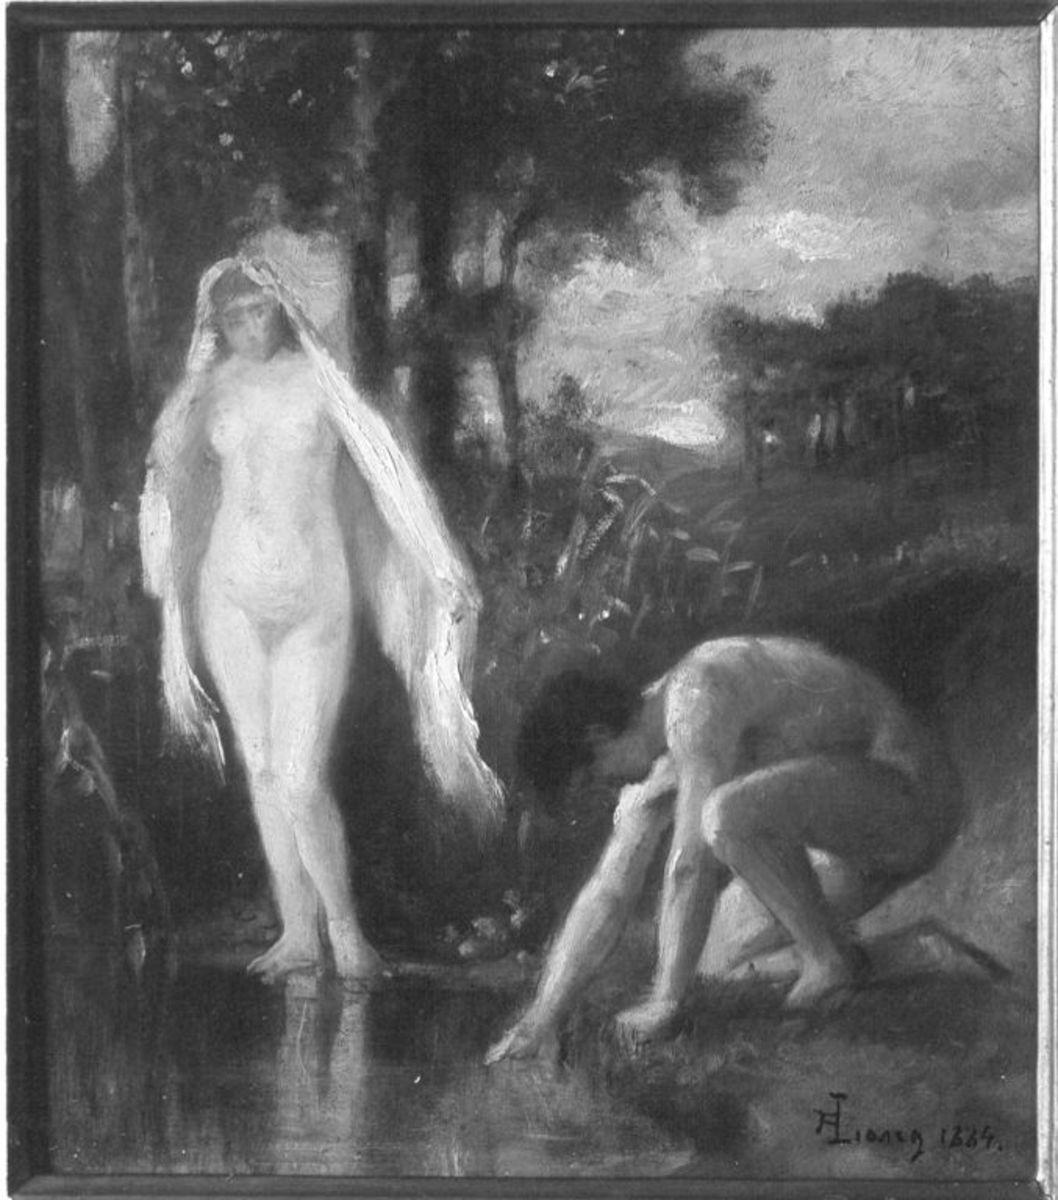 Badendes Paar in Landschaft